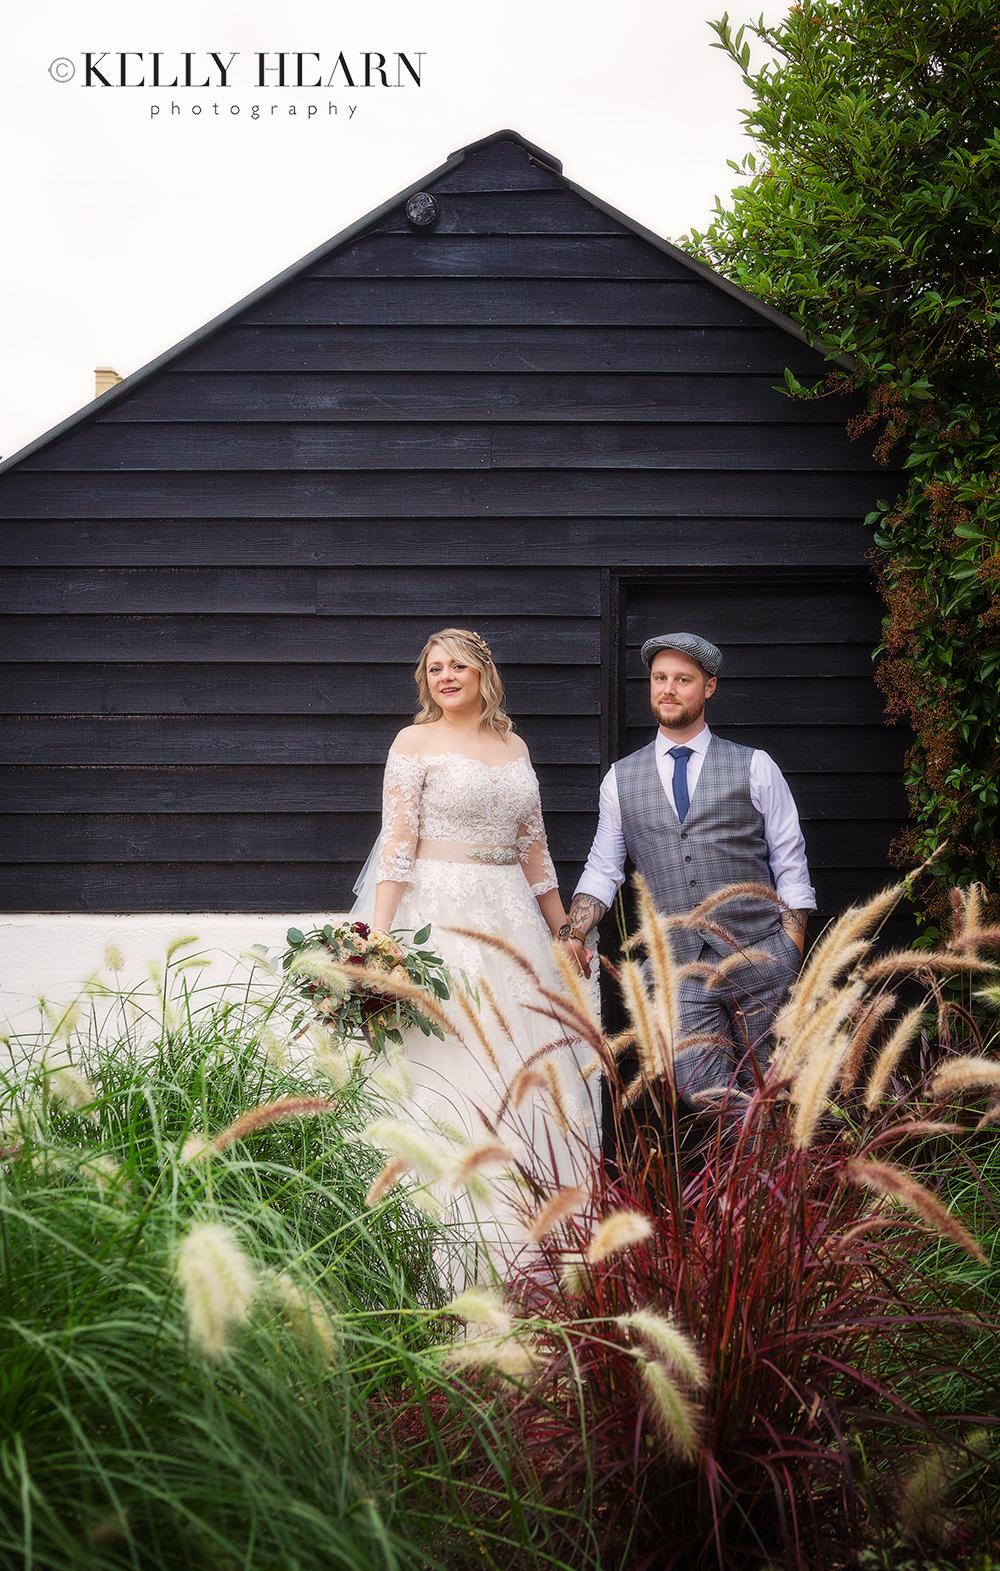 MAT_bride-and-groom-portrait-gardens.jpg#asset:2750